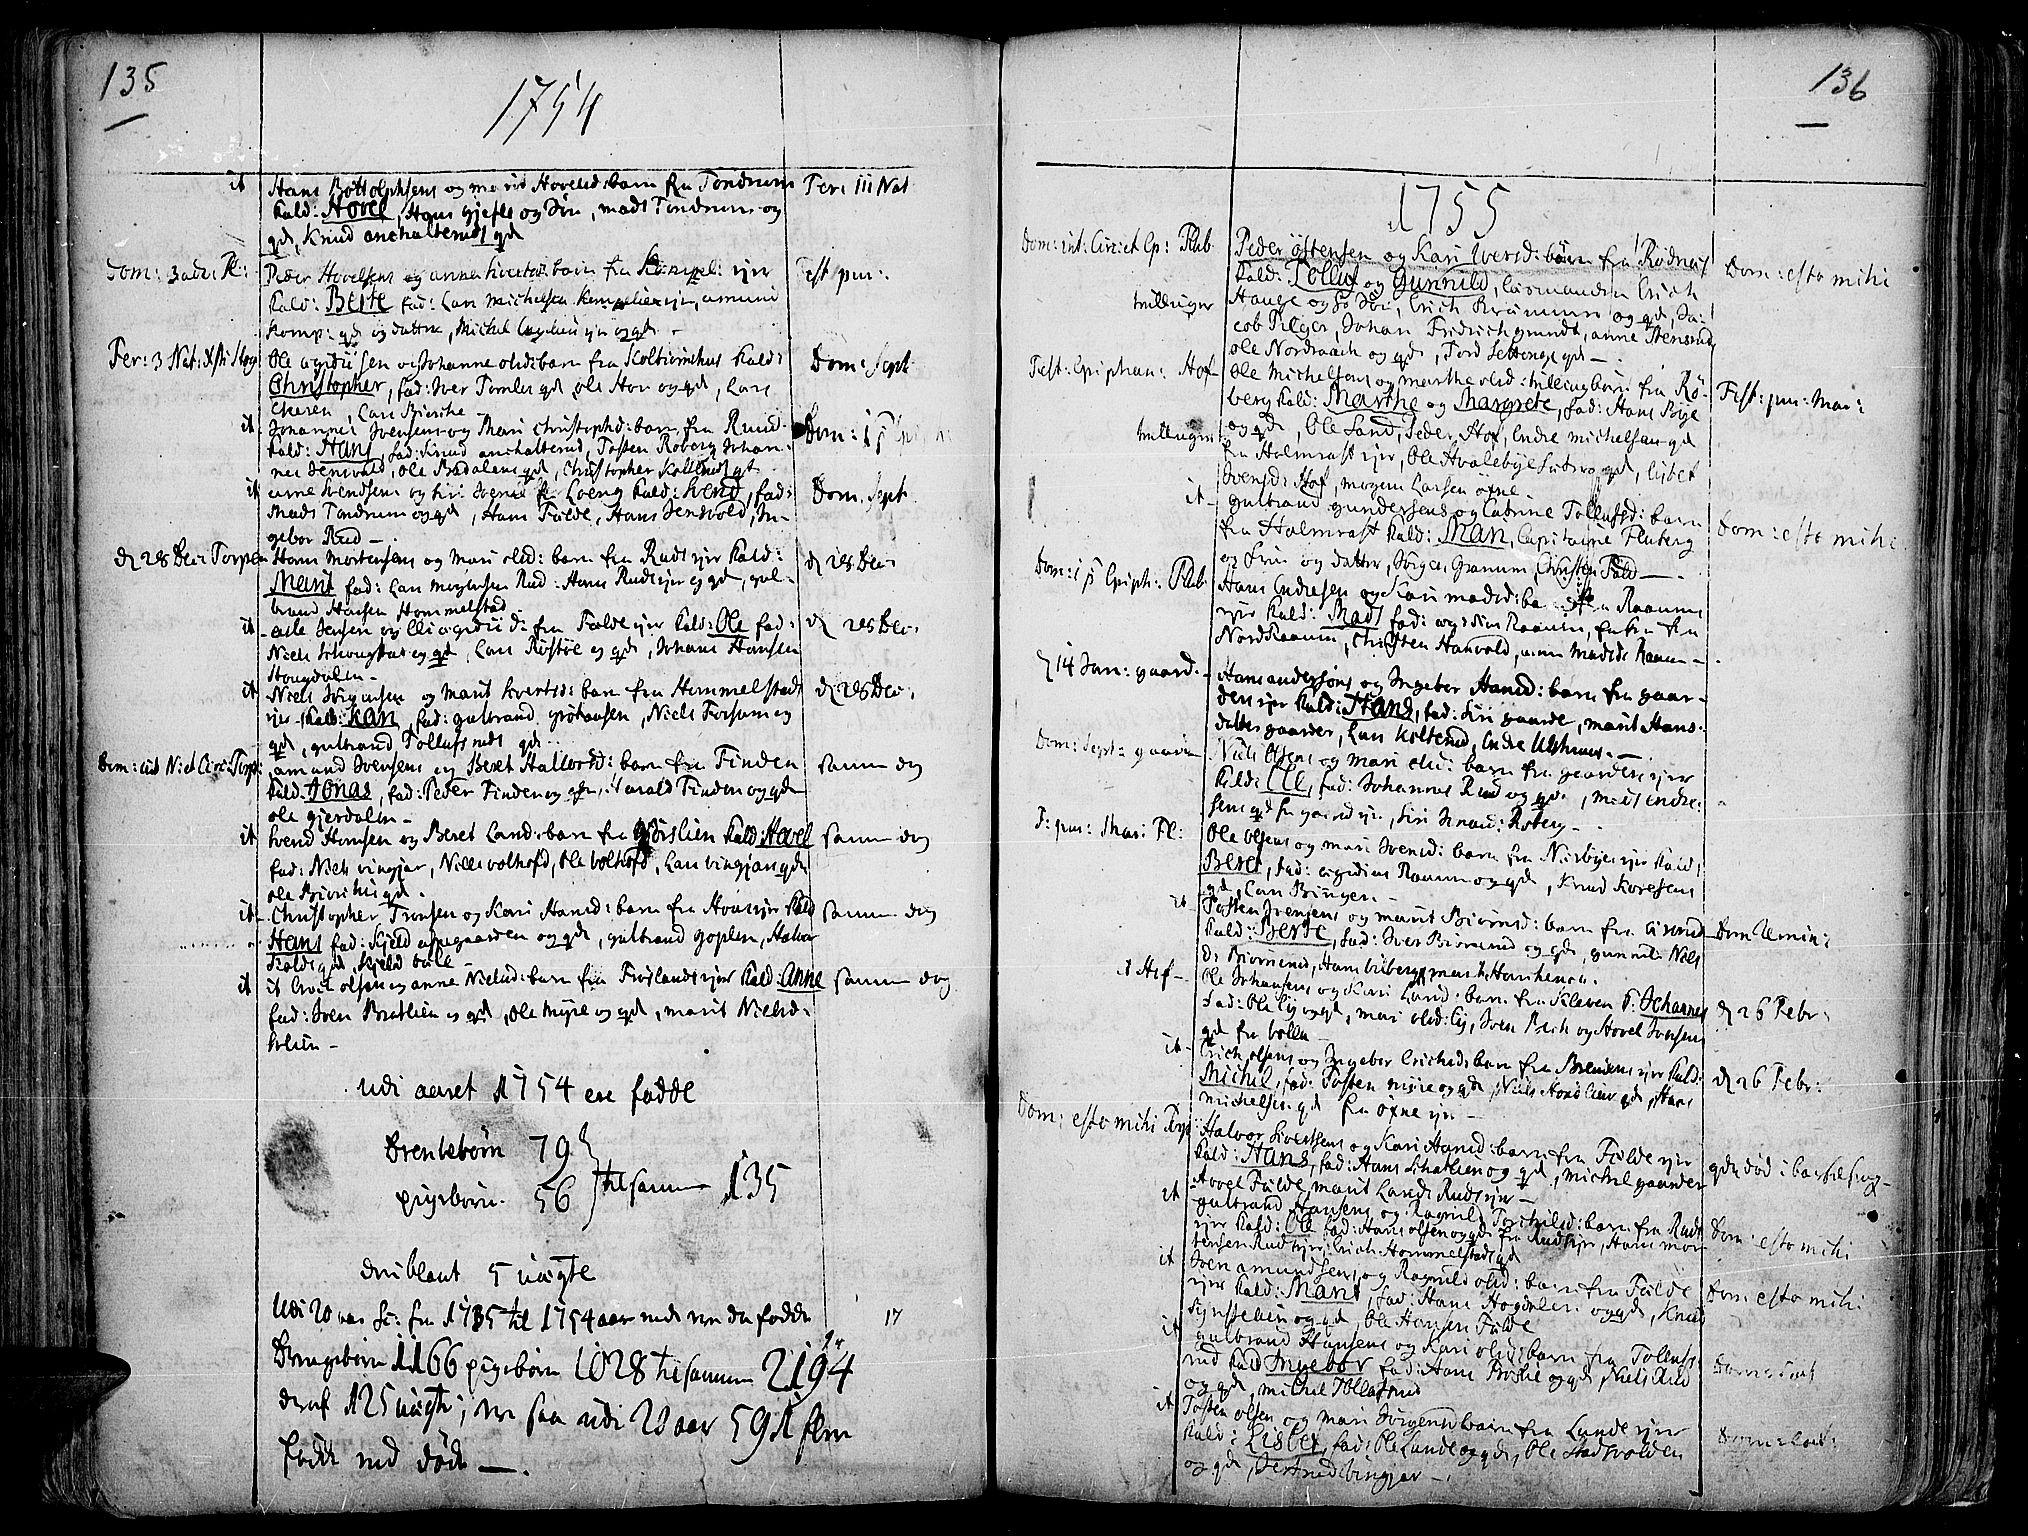 SAH, Land prestekontor, Ministerialbok nr. 2, 1733-1764, s. 135-136